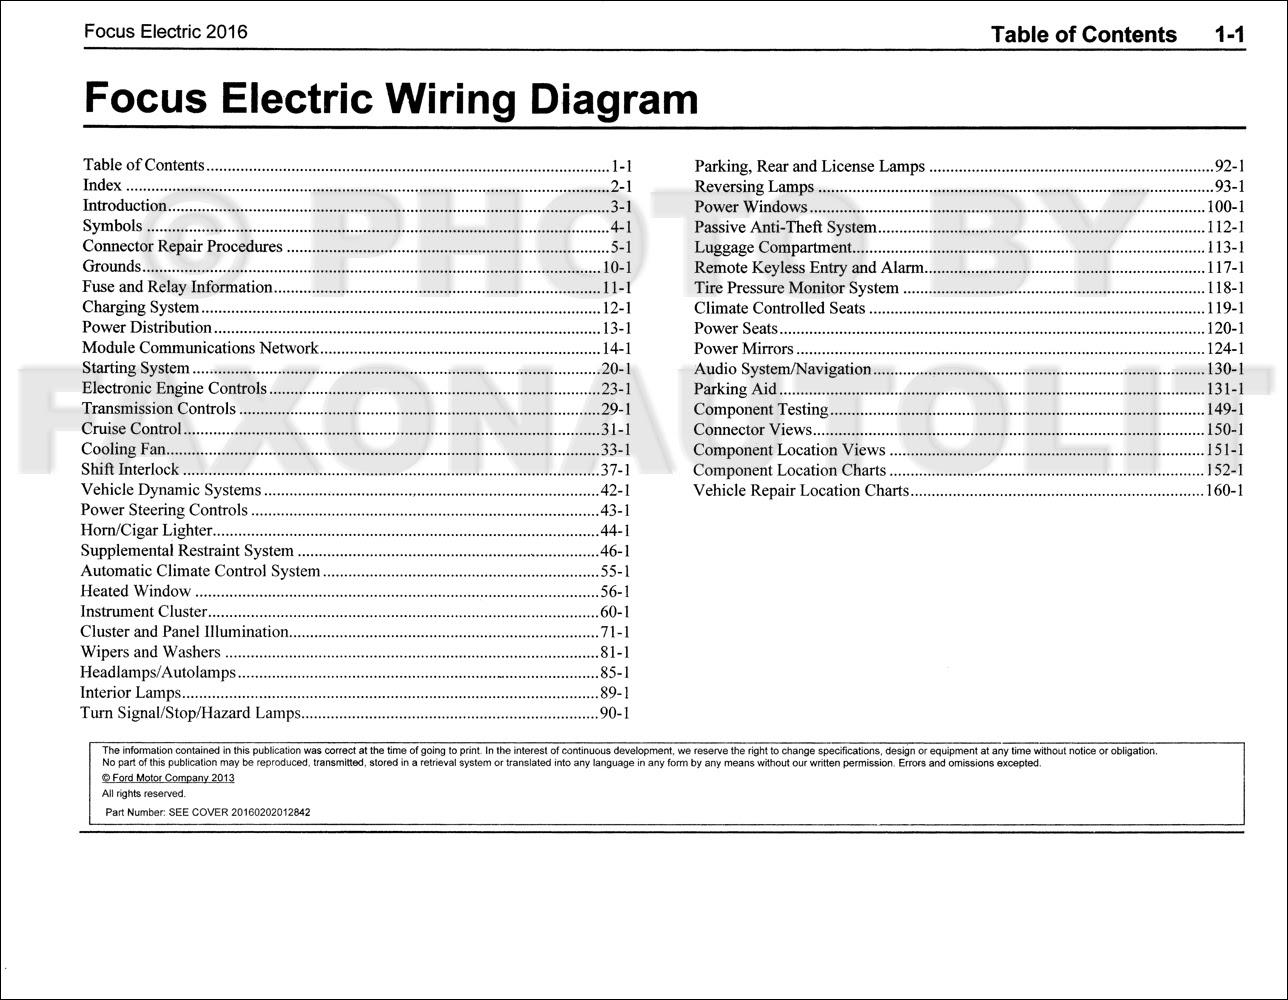 Manuals 2013 Ford Focus Electric Wiring Diagram Manual Original All Electric Plug In Full Version Hd Quality Plug In Guidemanualblog Ristoranteveganomilano It